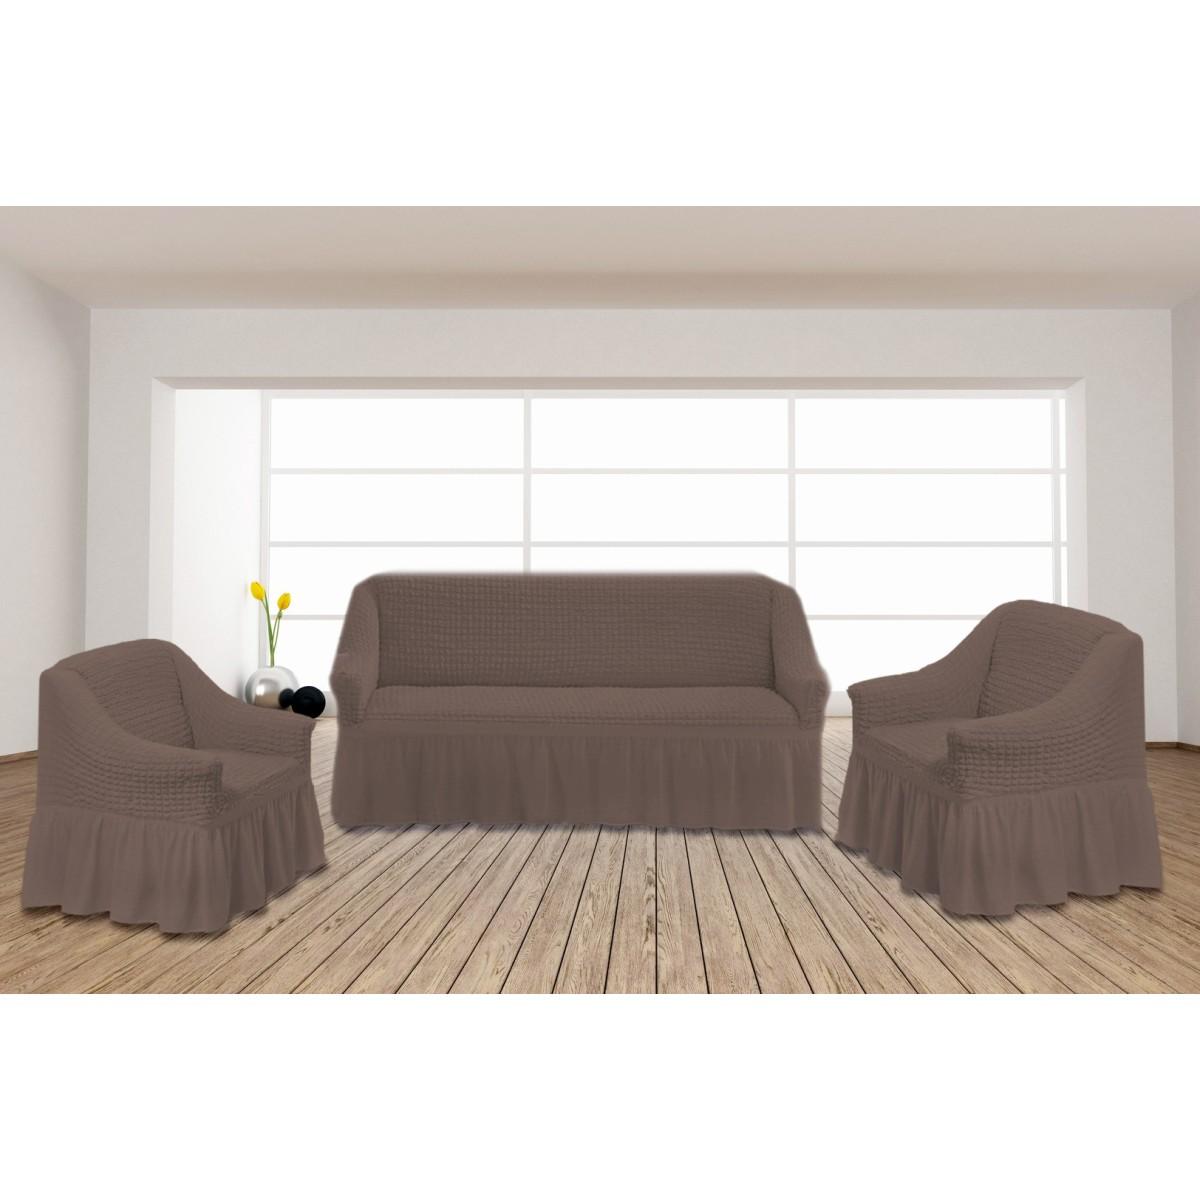 Комплект чехлов для мебели Texrepublic Absolute 8819